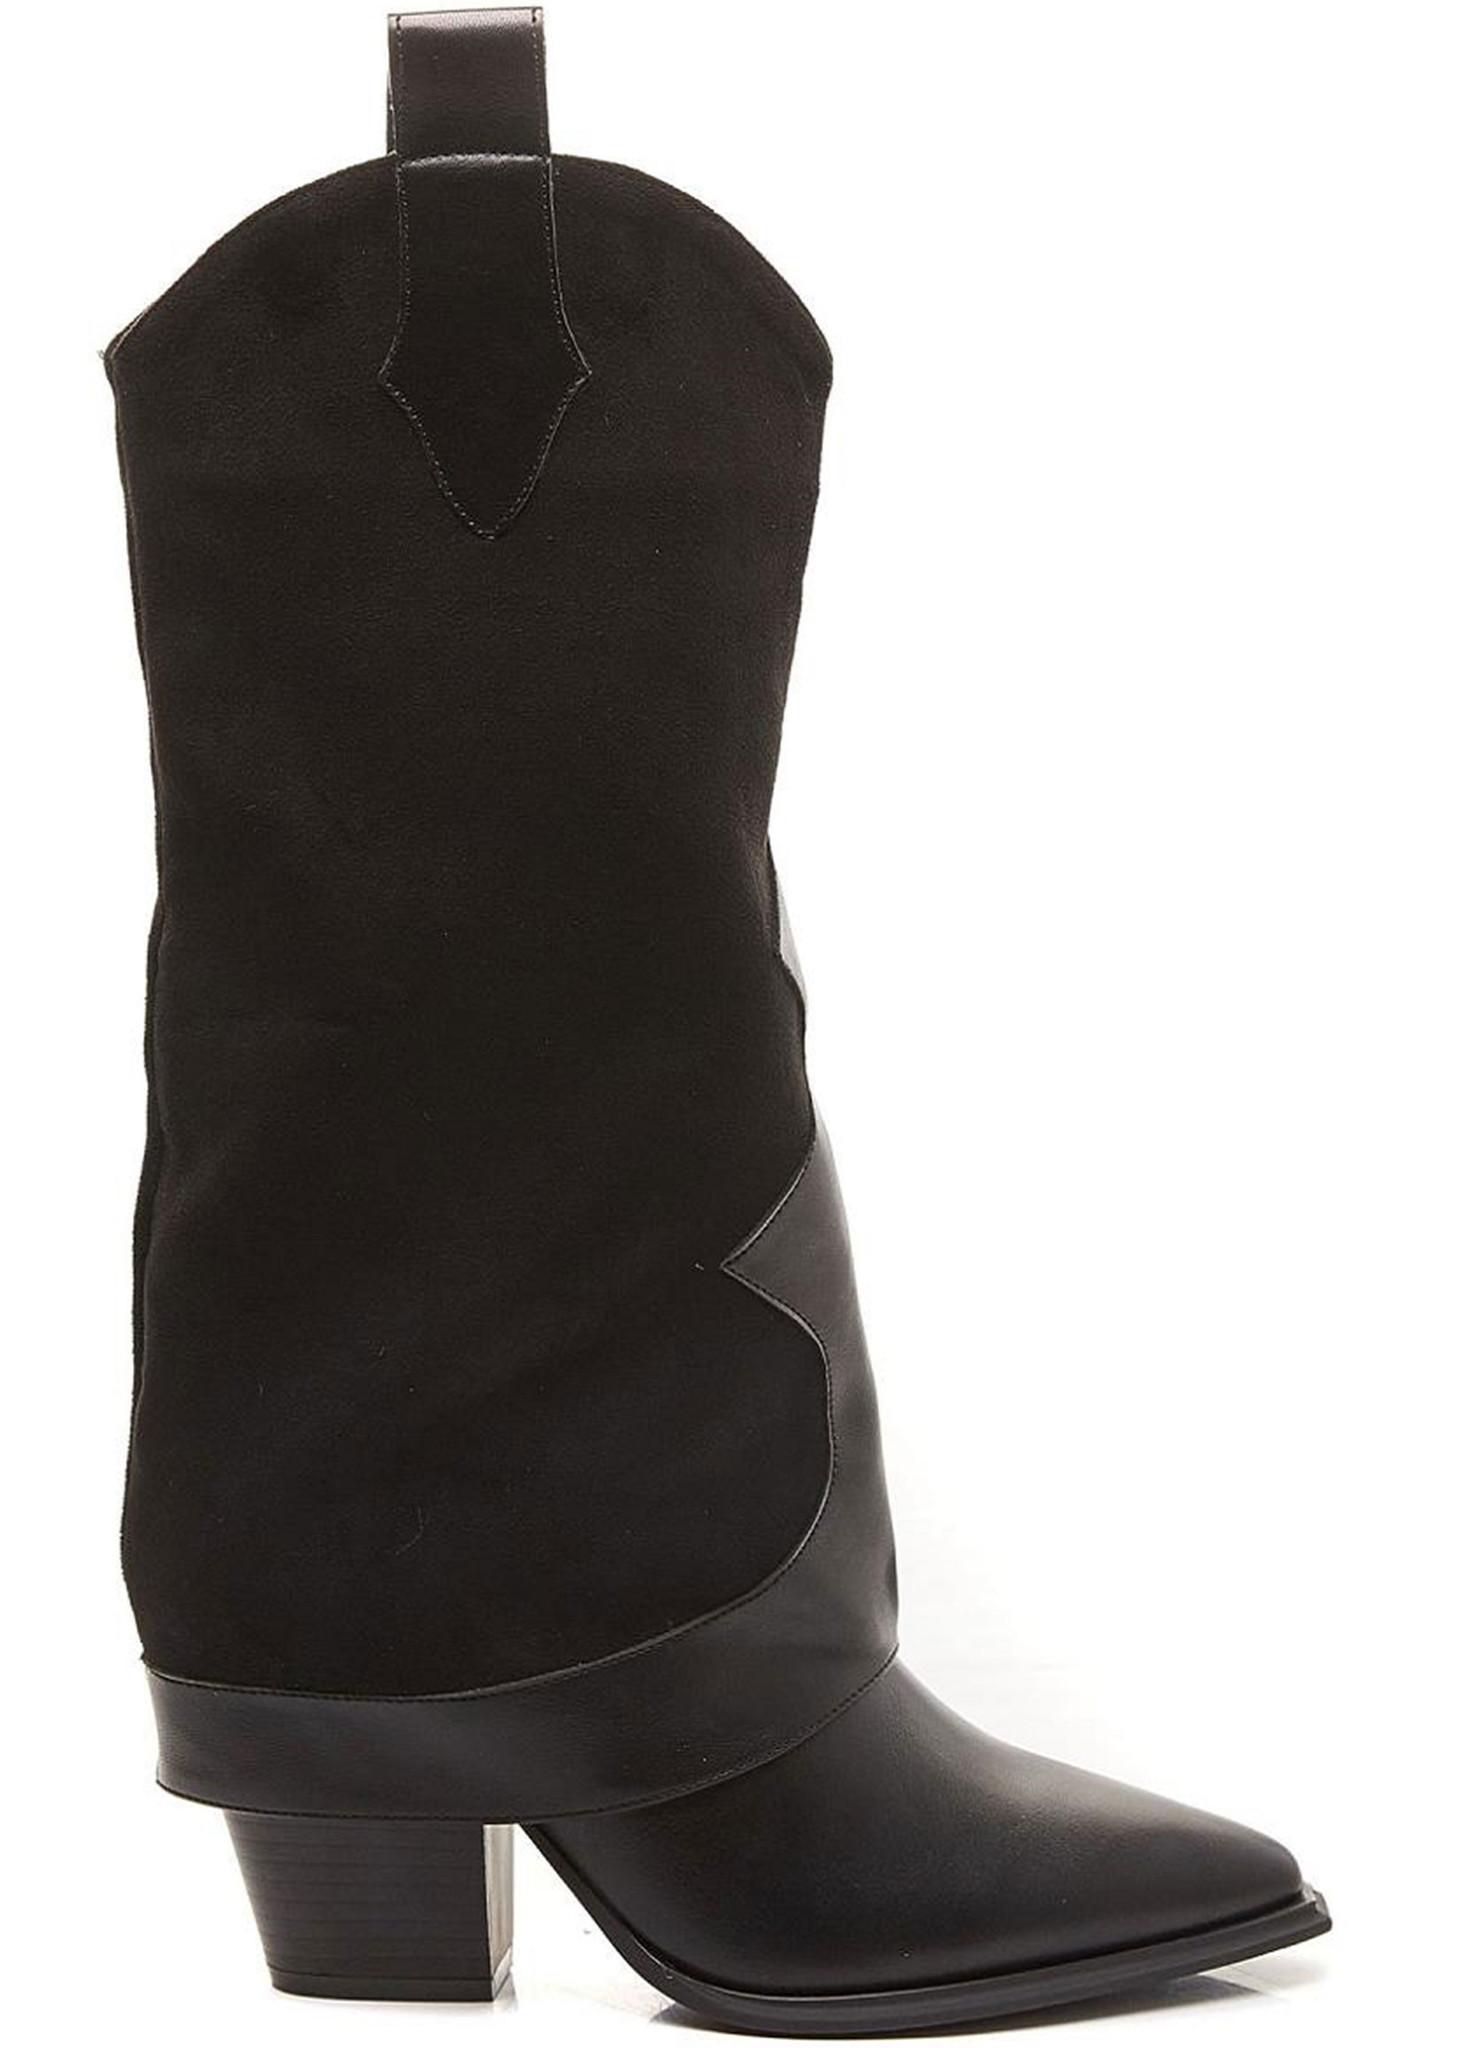 Western Boots Zwart-1